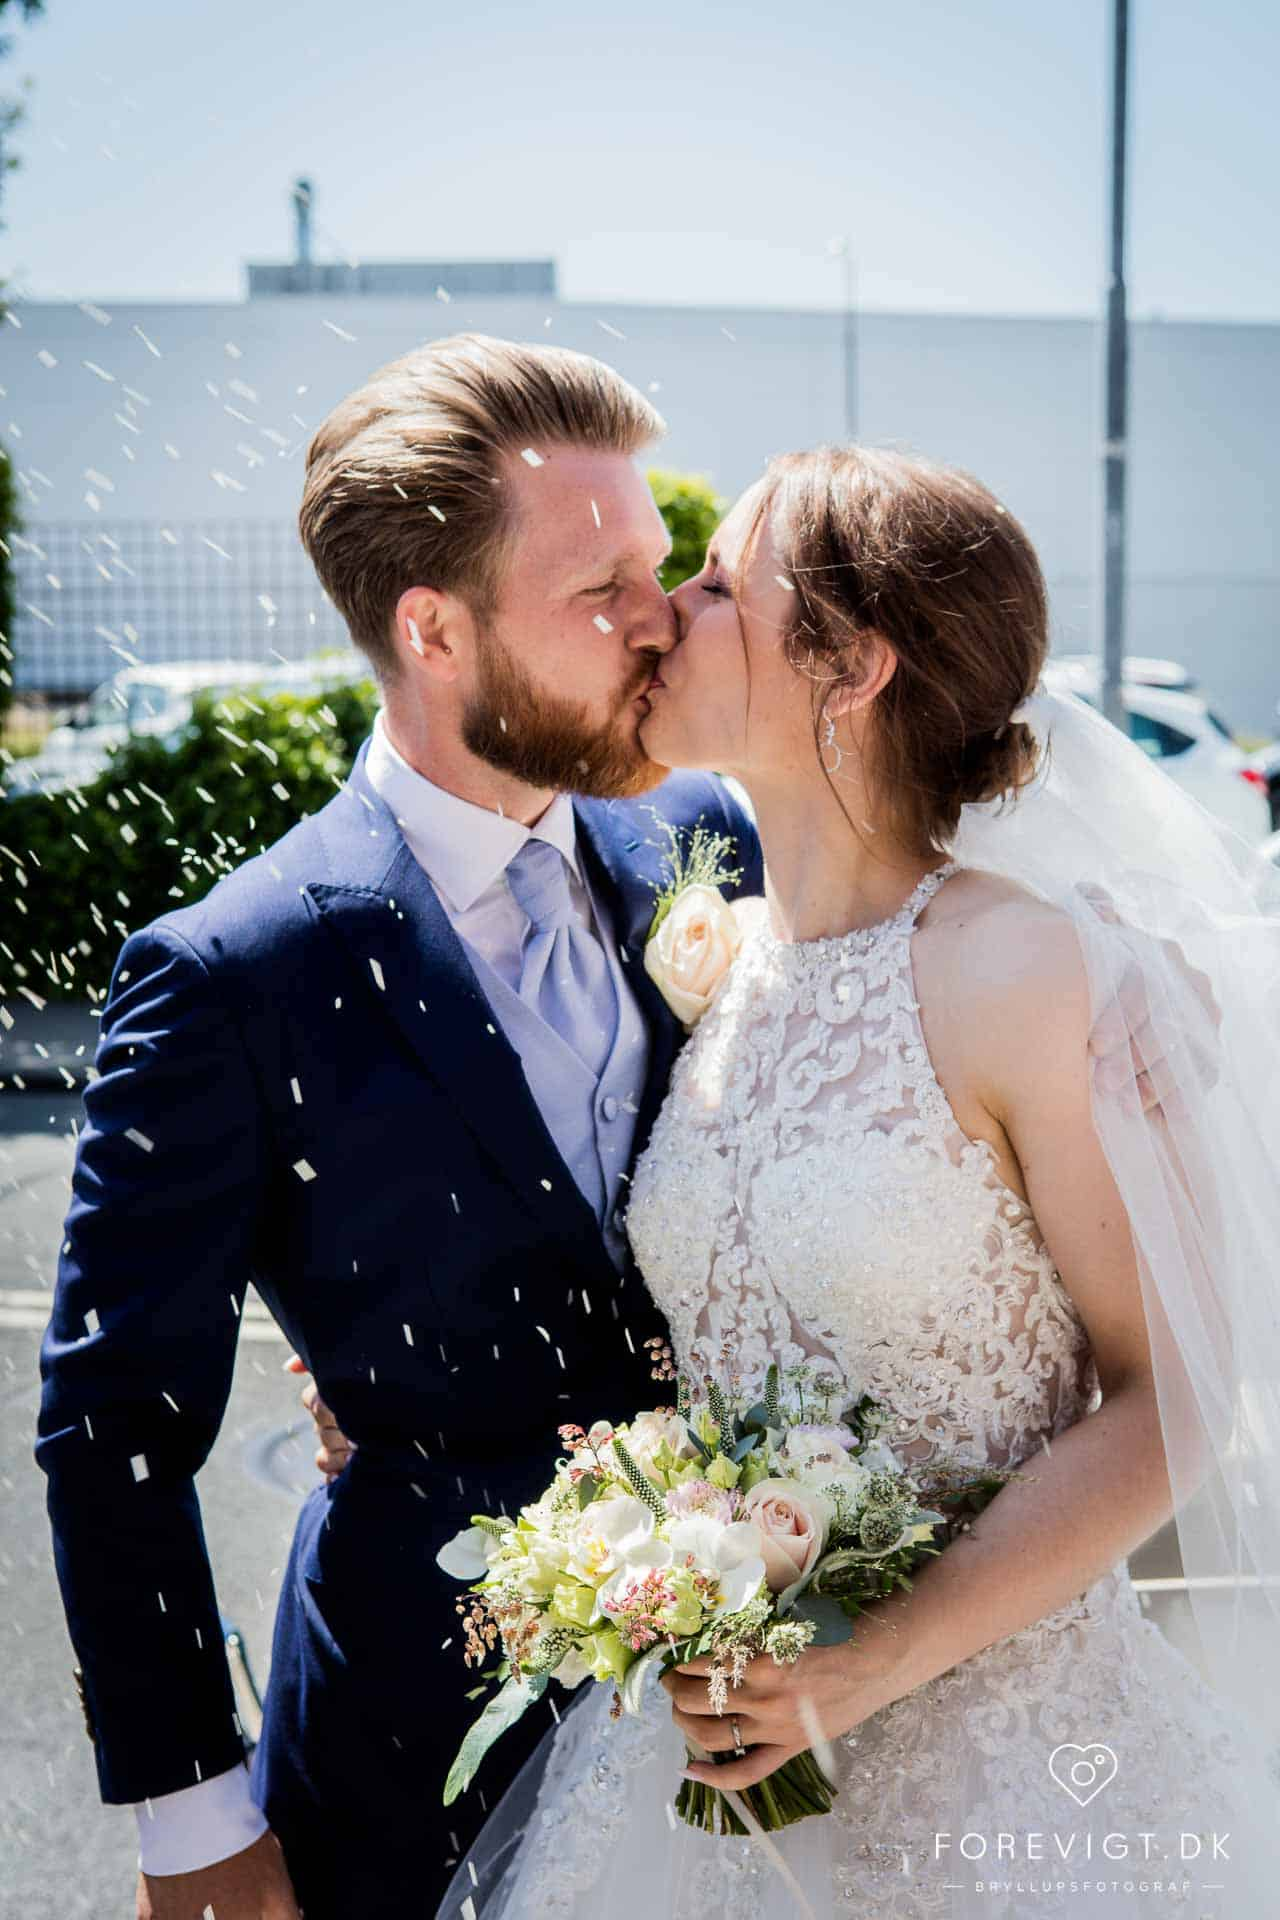 Frimurere logen bryllupsfoto